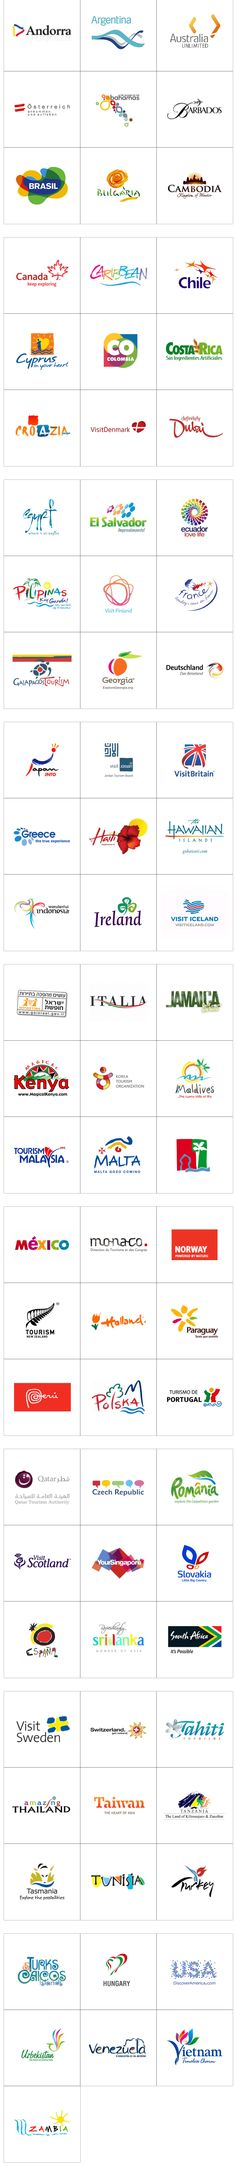 nation branding #nationbranding territorial branding #territorialbranding